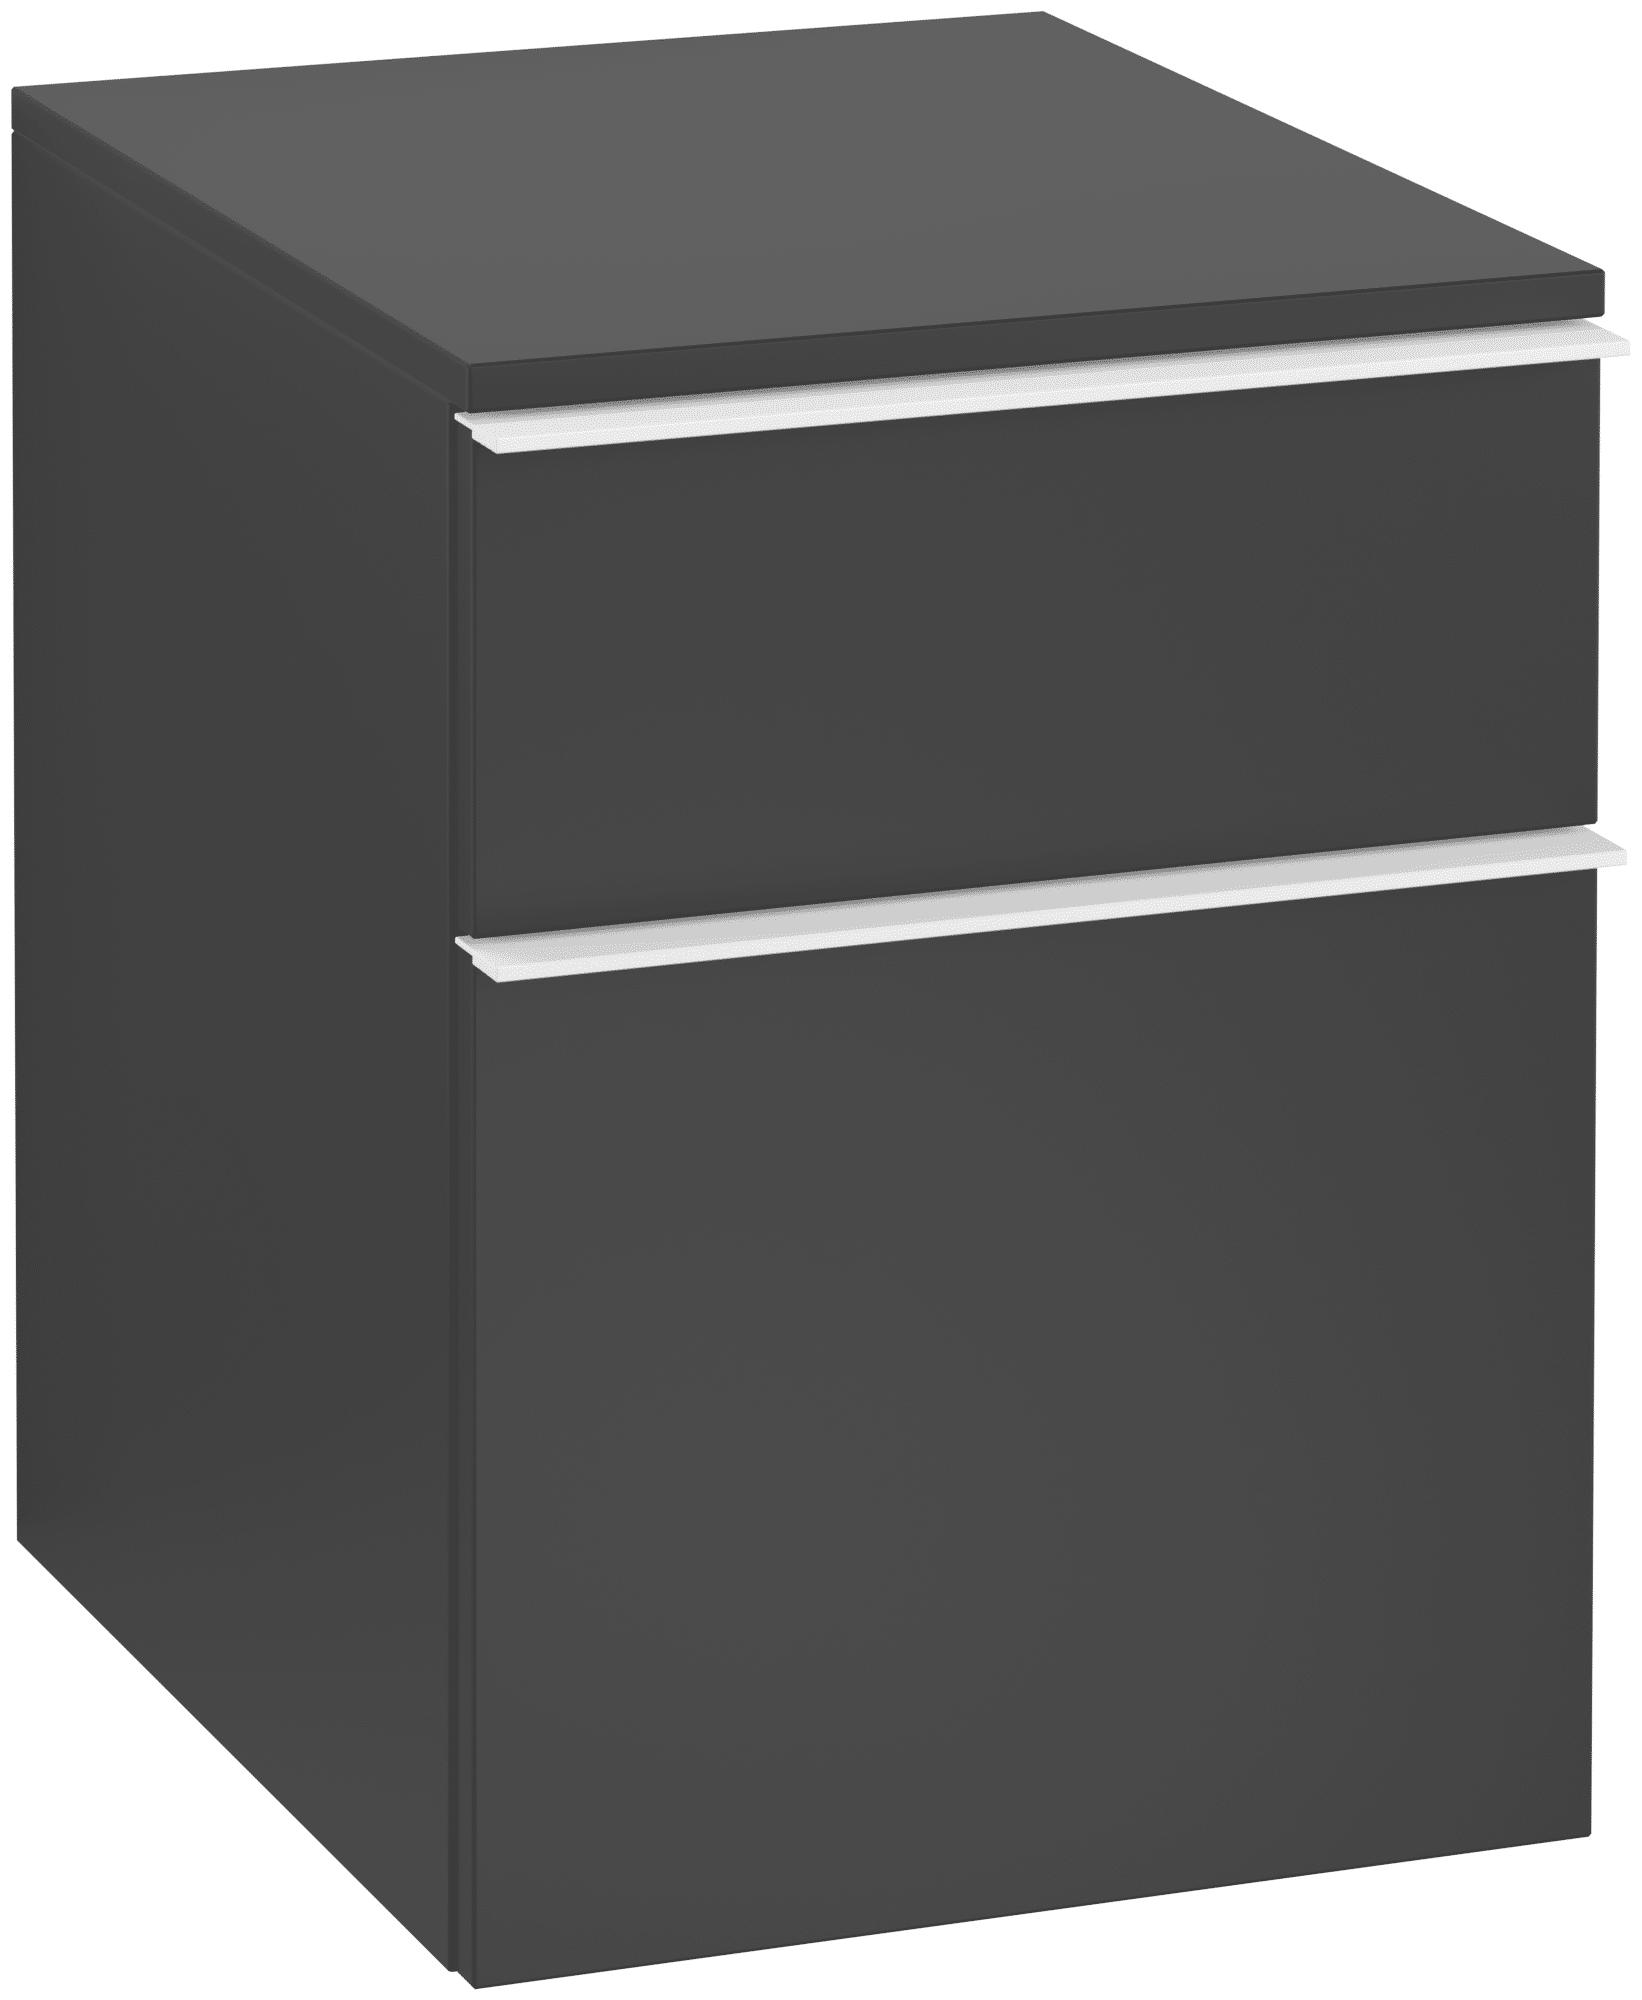 Villeroy & Boch Villeroy & Boch Venticello - Anbauschrank A954 404 x 529 x  477 mm Griff white black matt lacquer